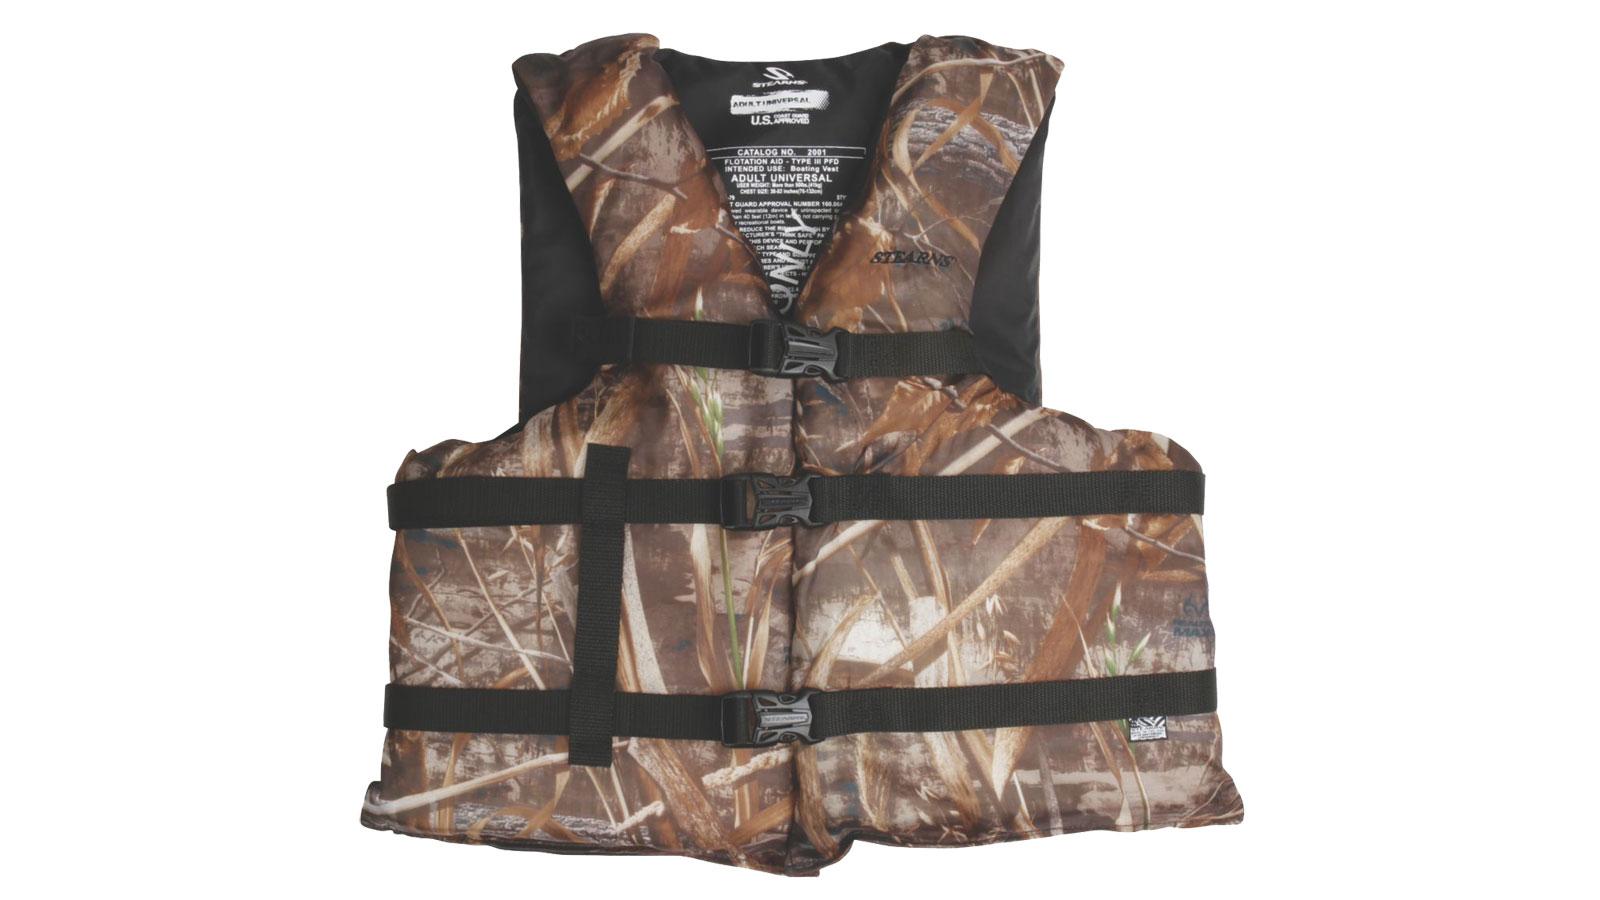 Stearns Adult Boating Oversized Max 5 Vest